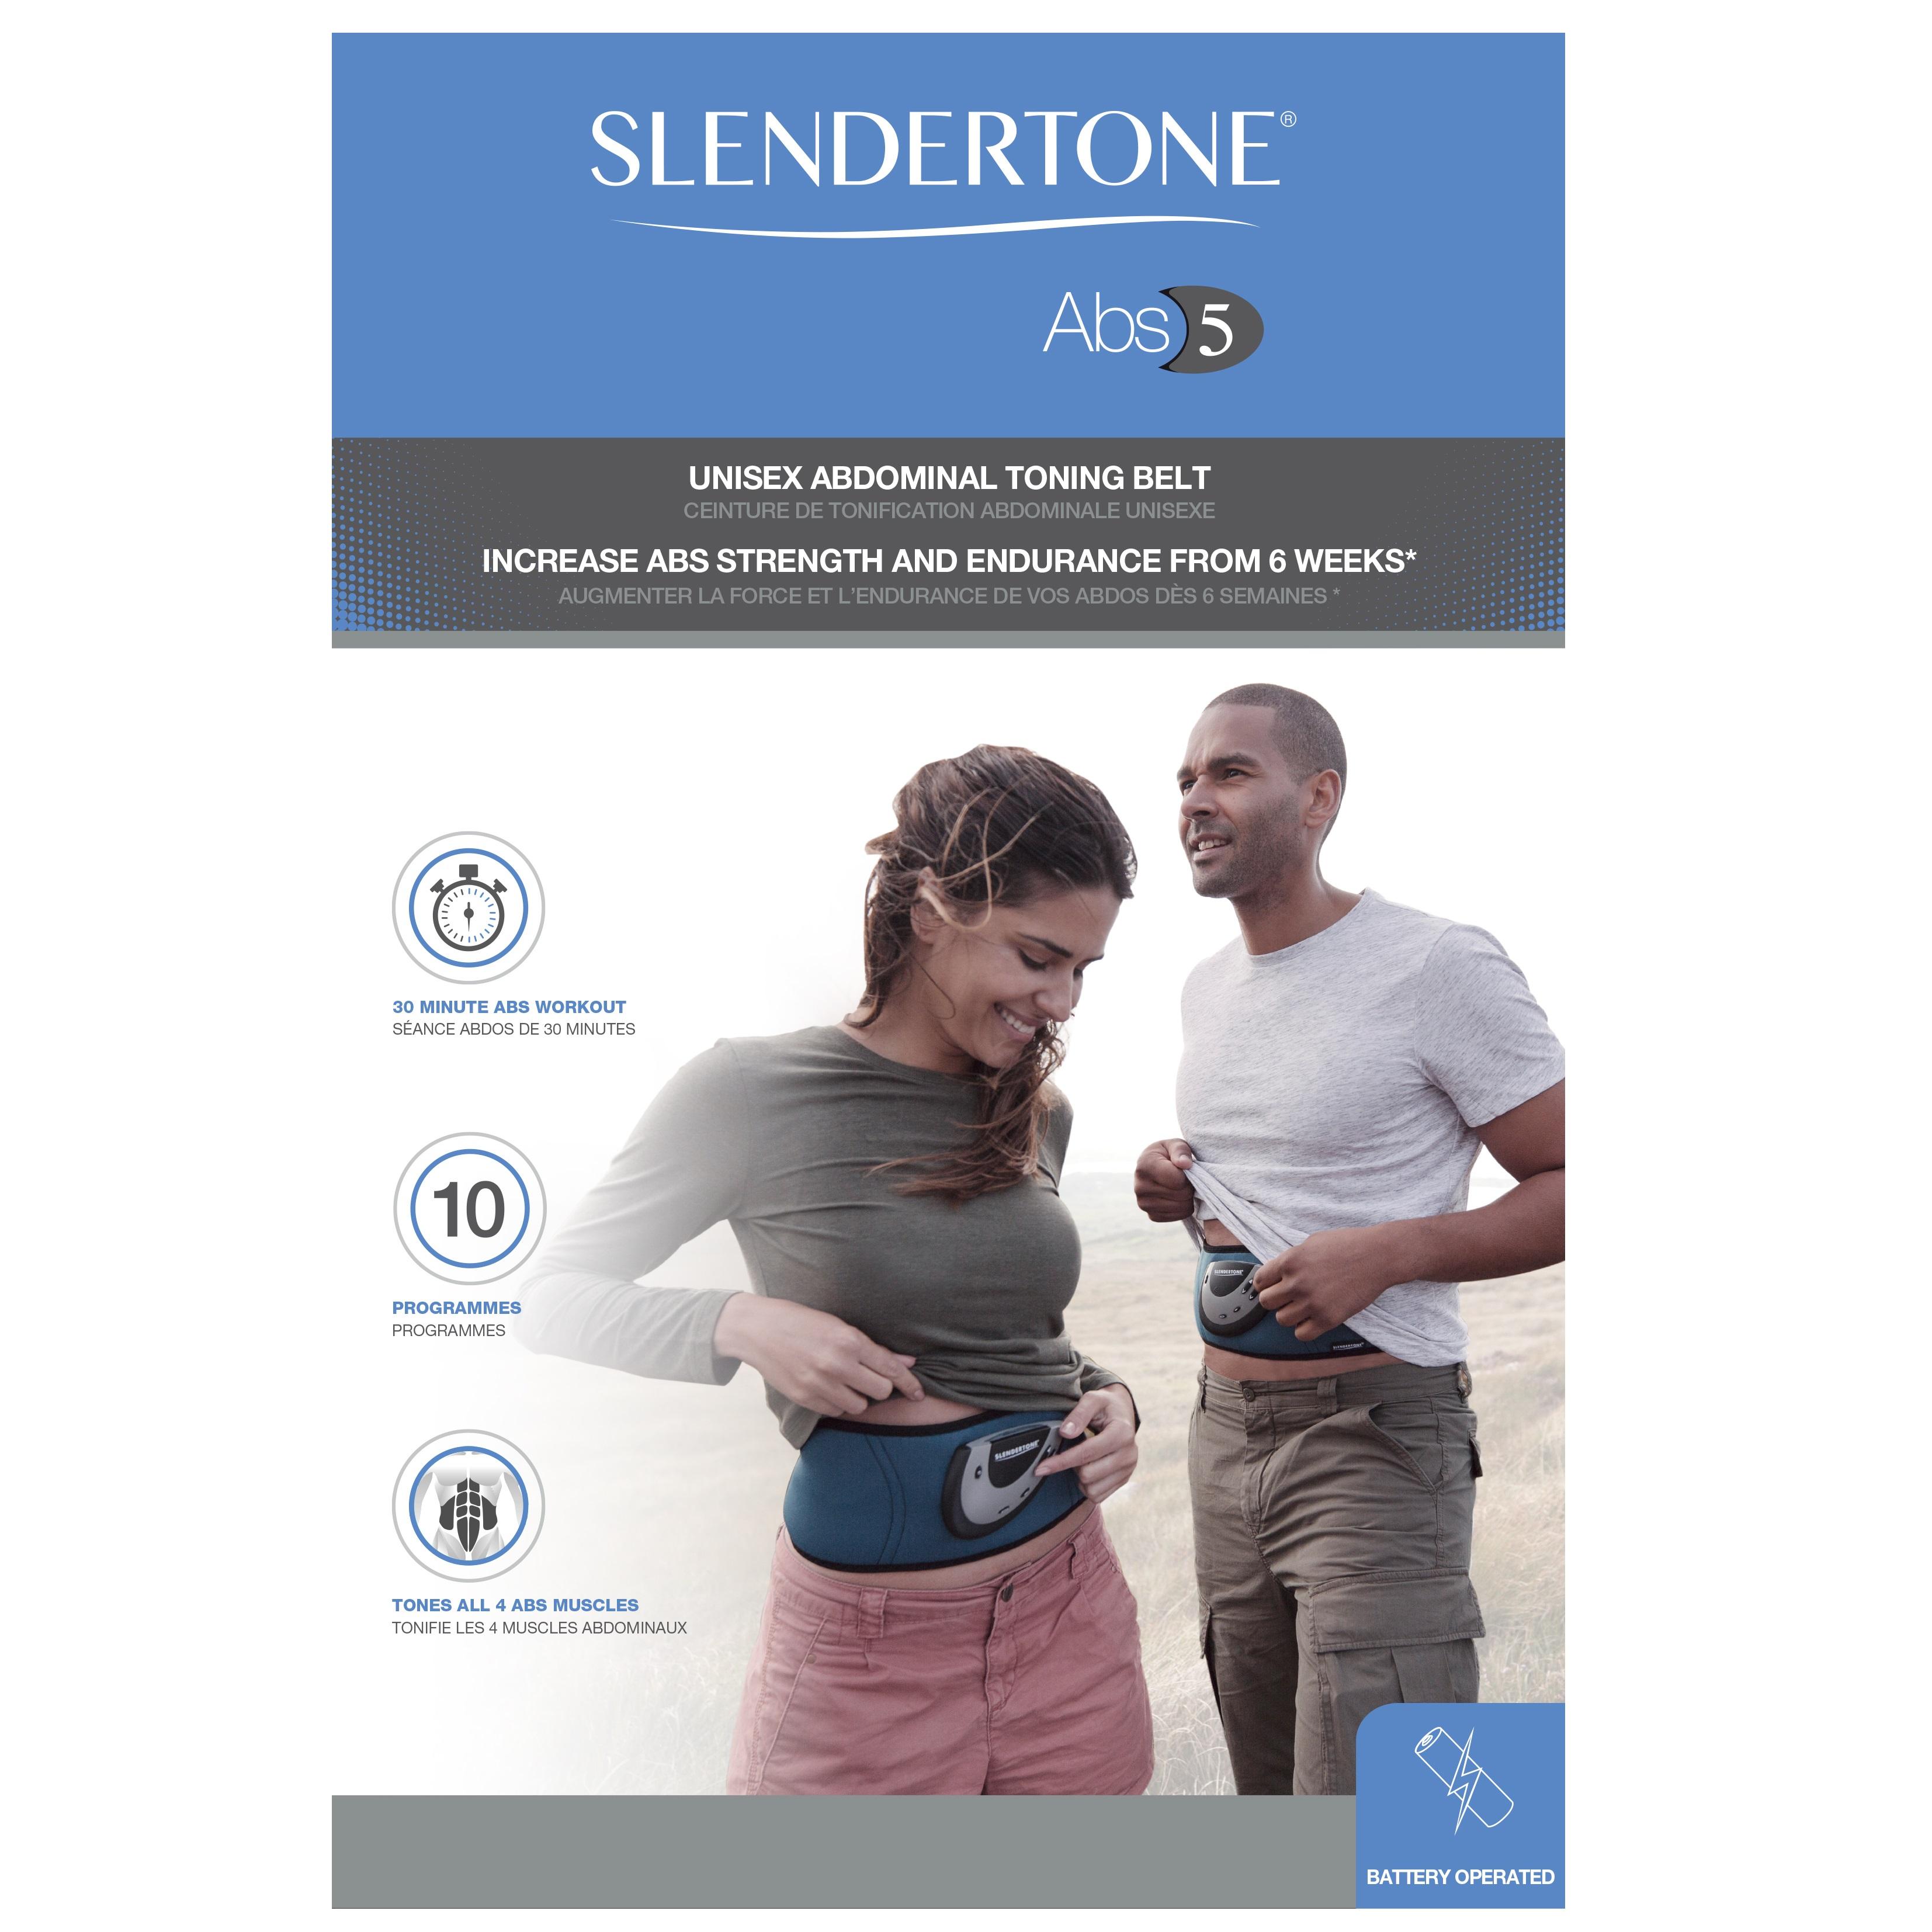 Slendertone Abs 5